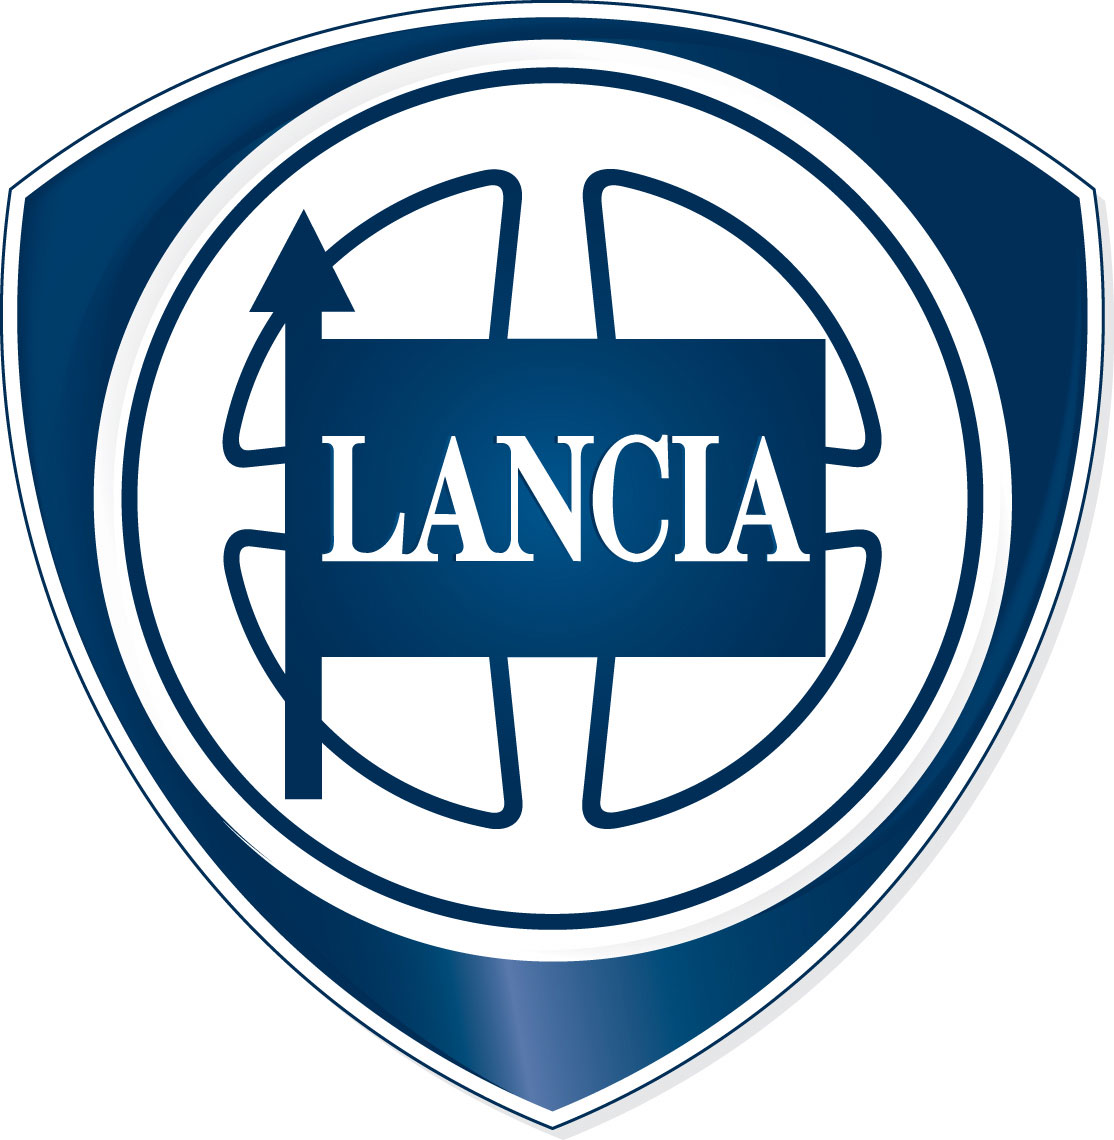 Pastiglie freno CL Lancia